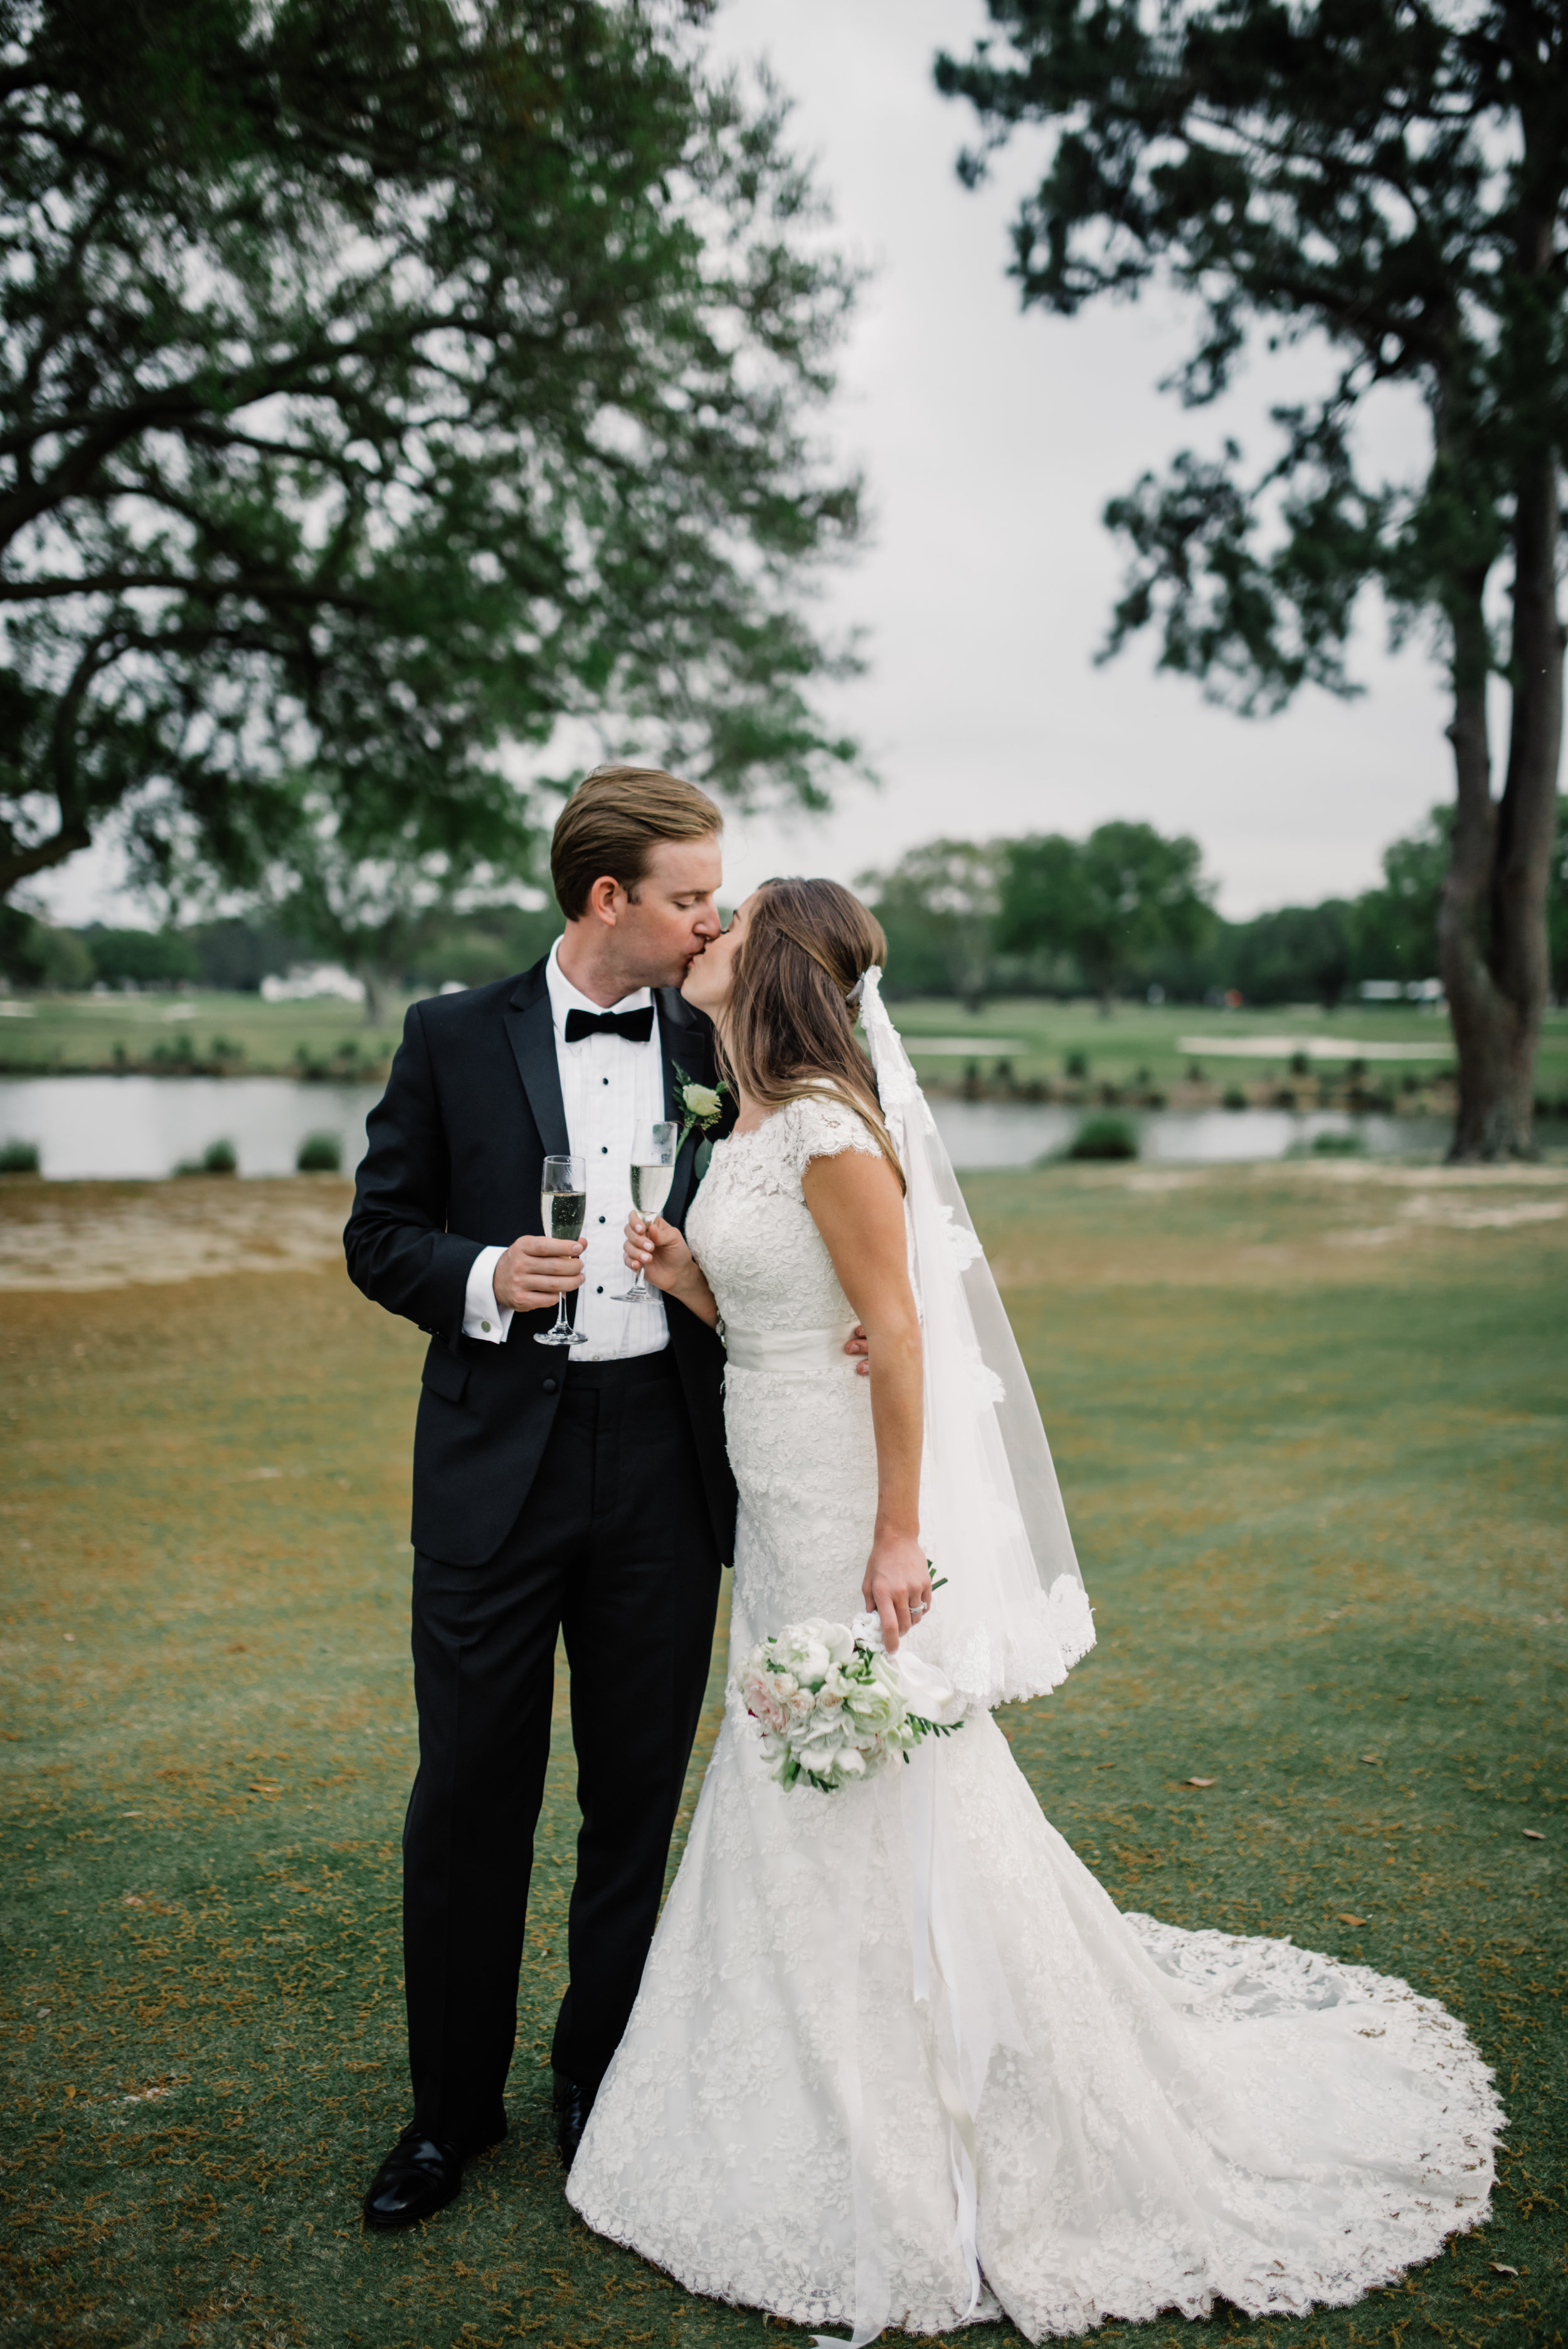 Annie & Campbell's Wedding